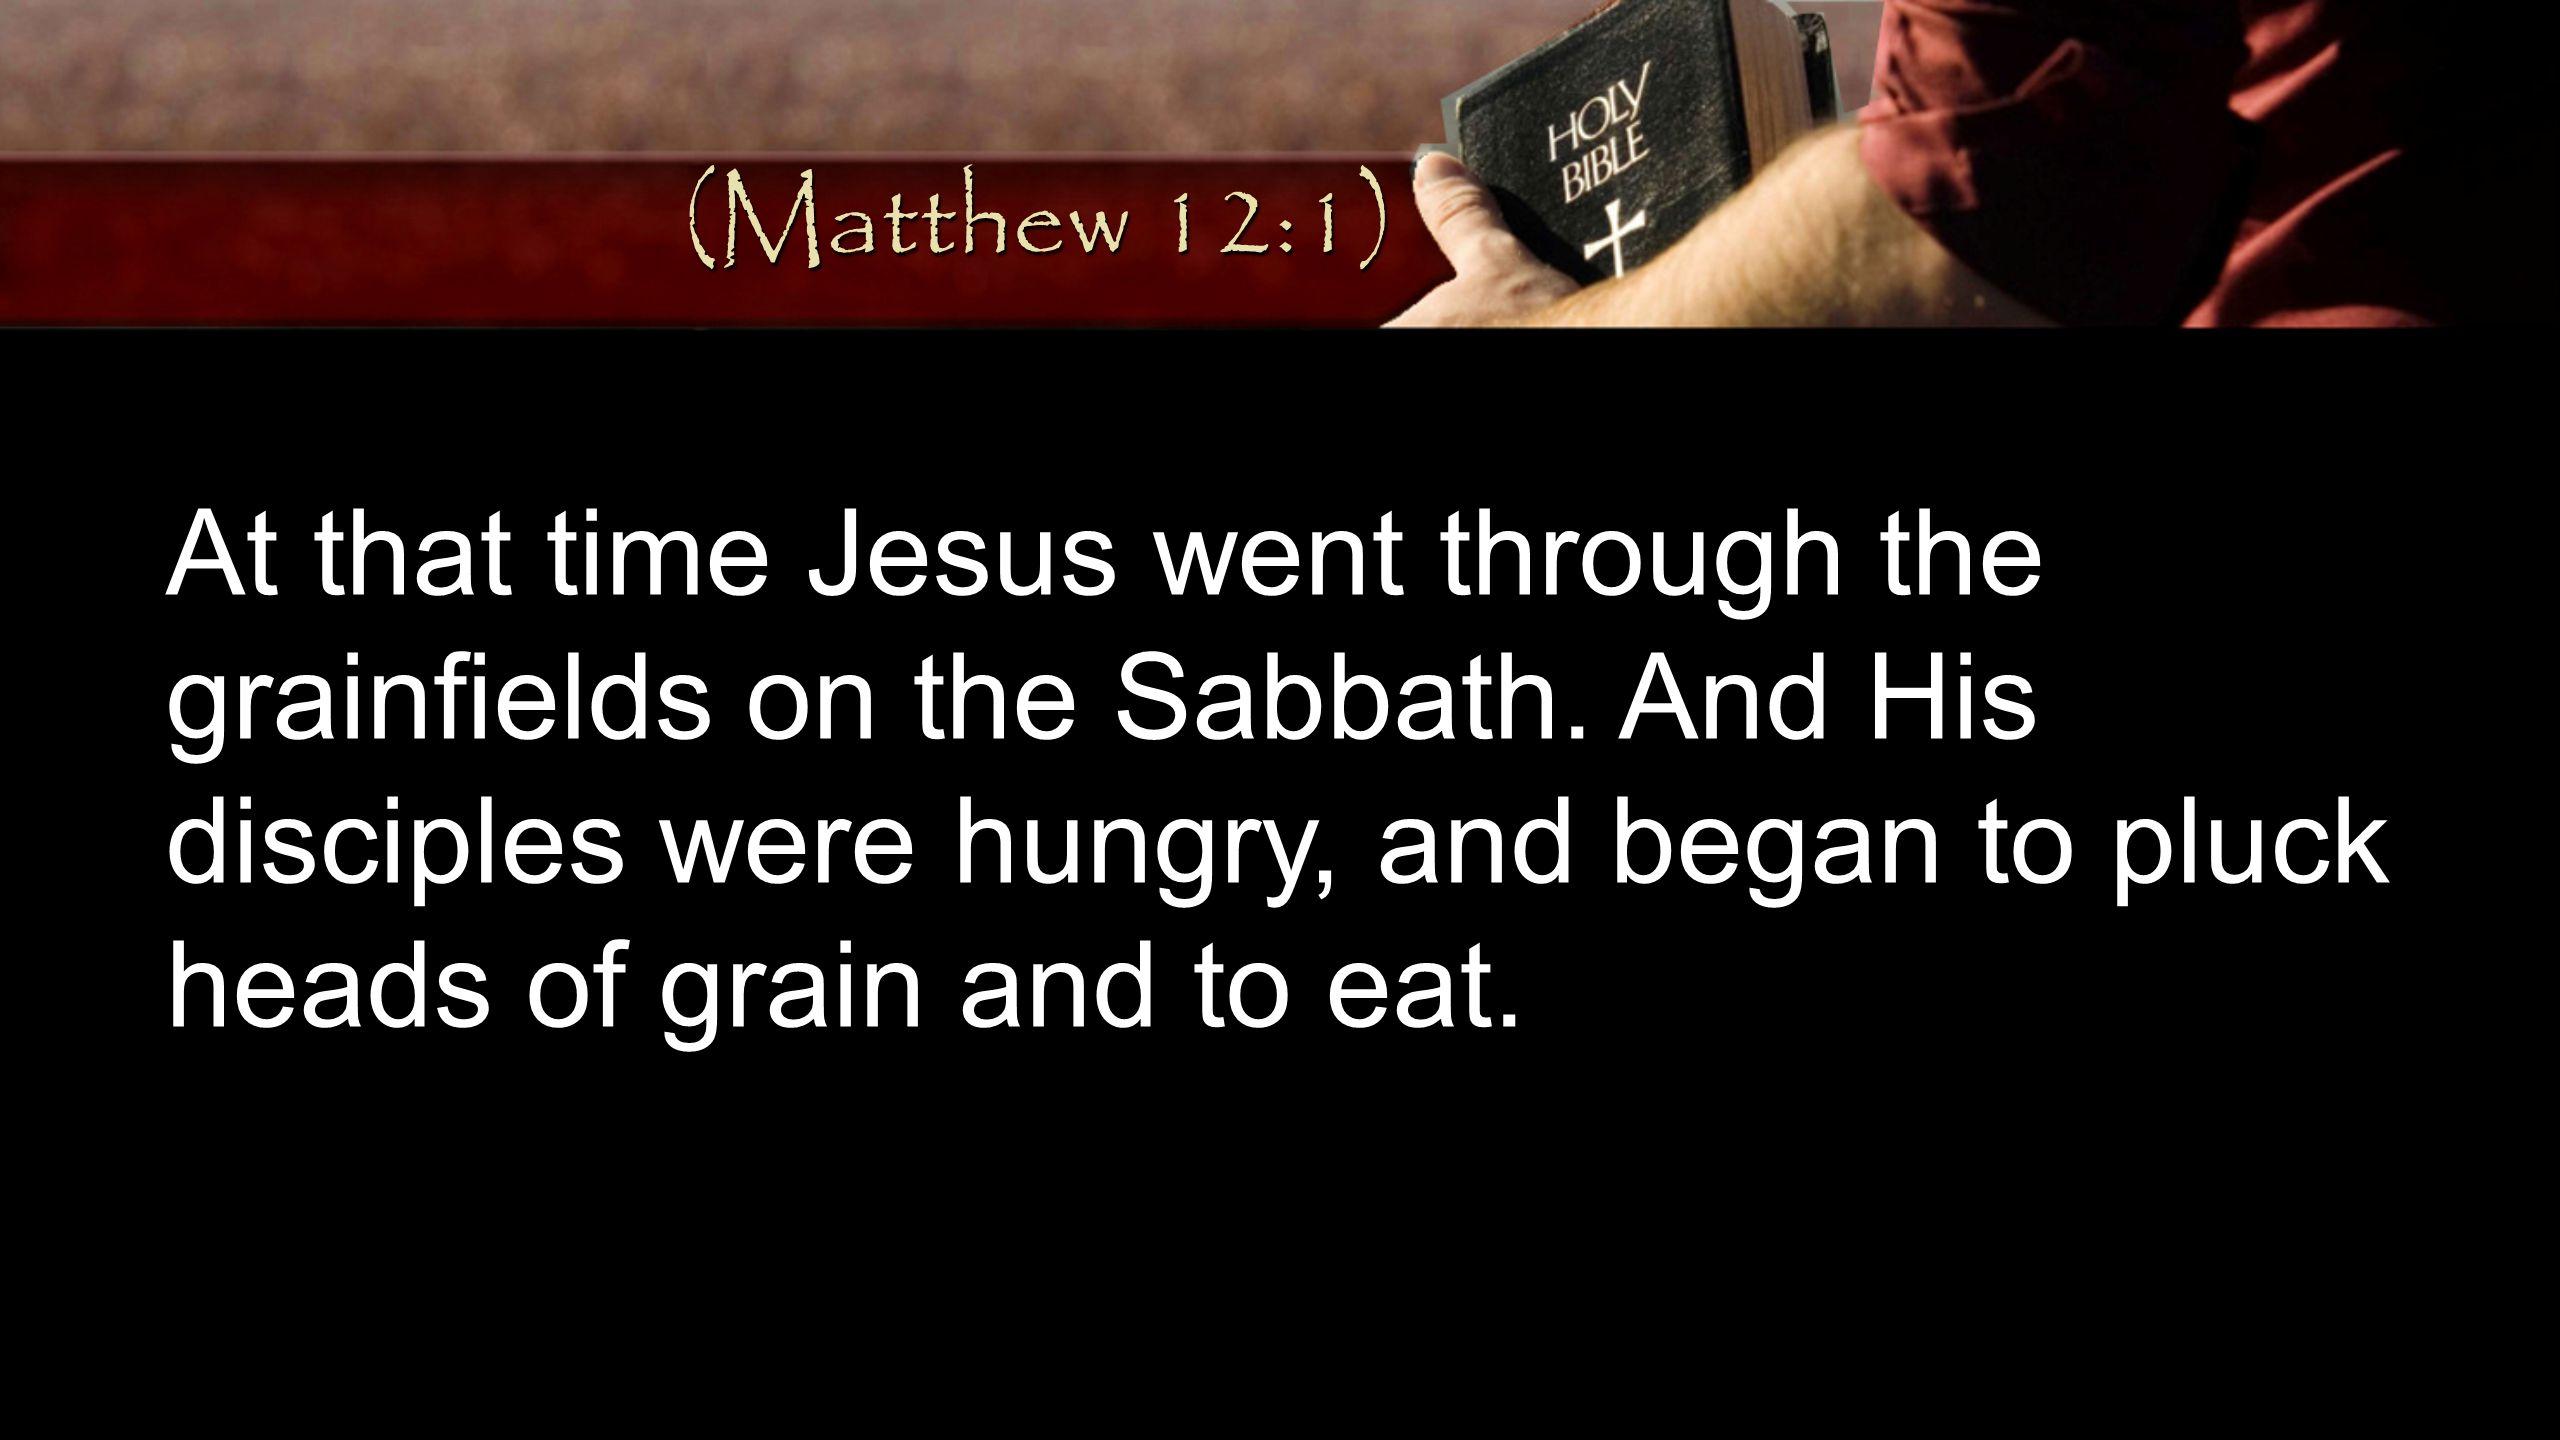 (Matthew 12:1)